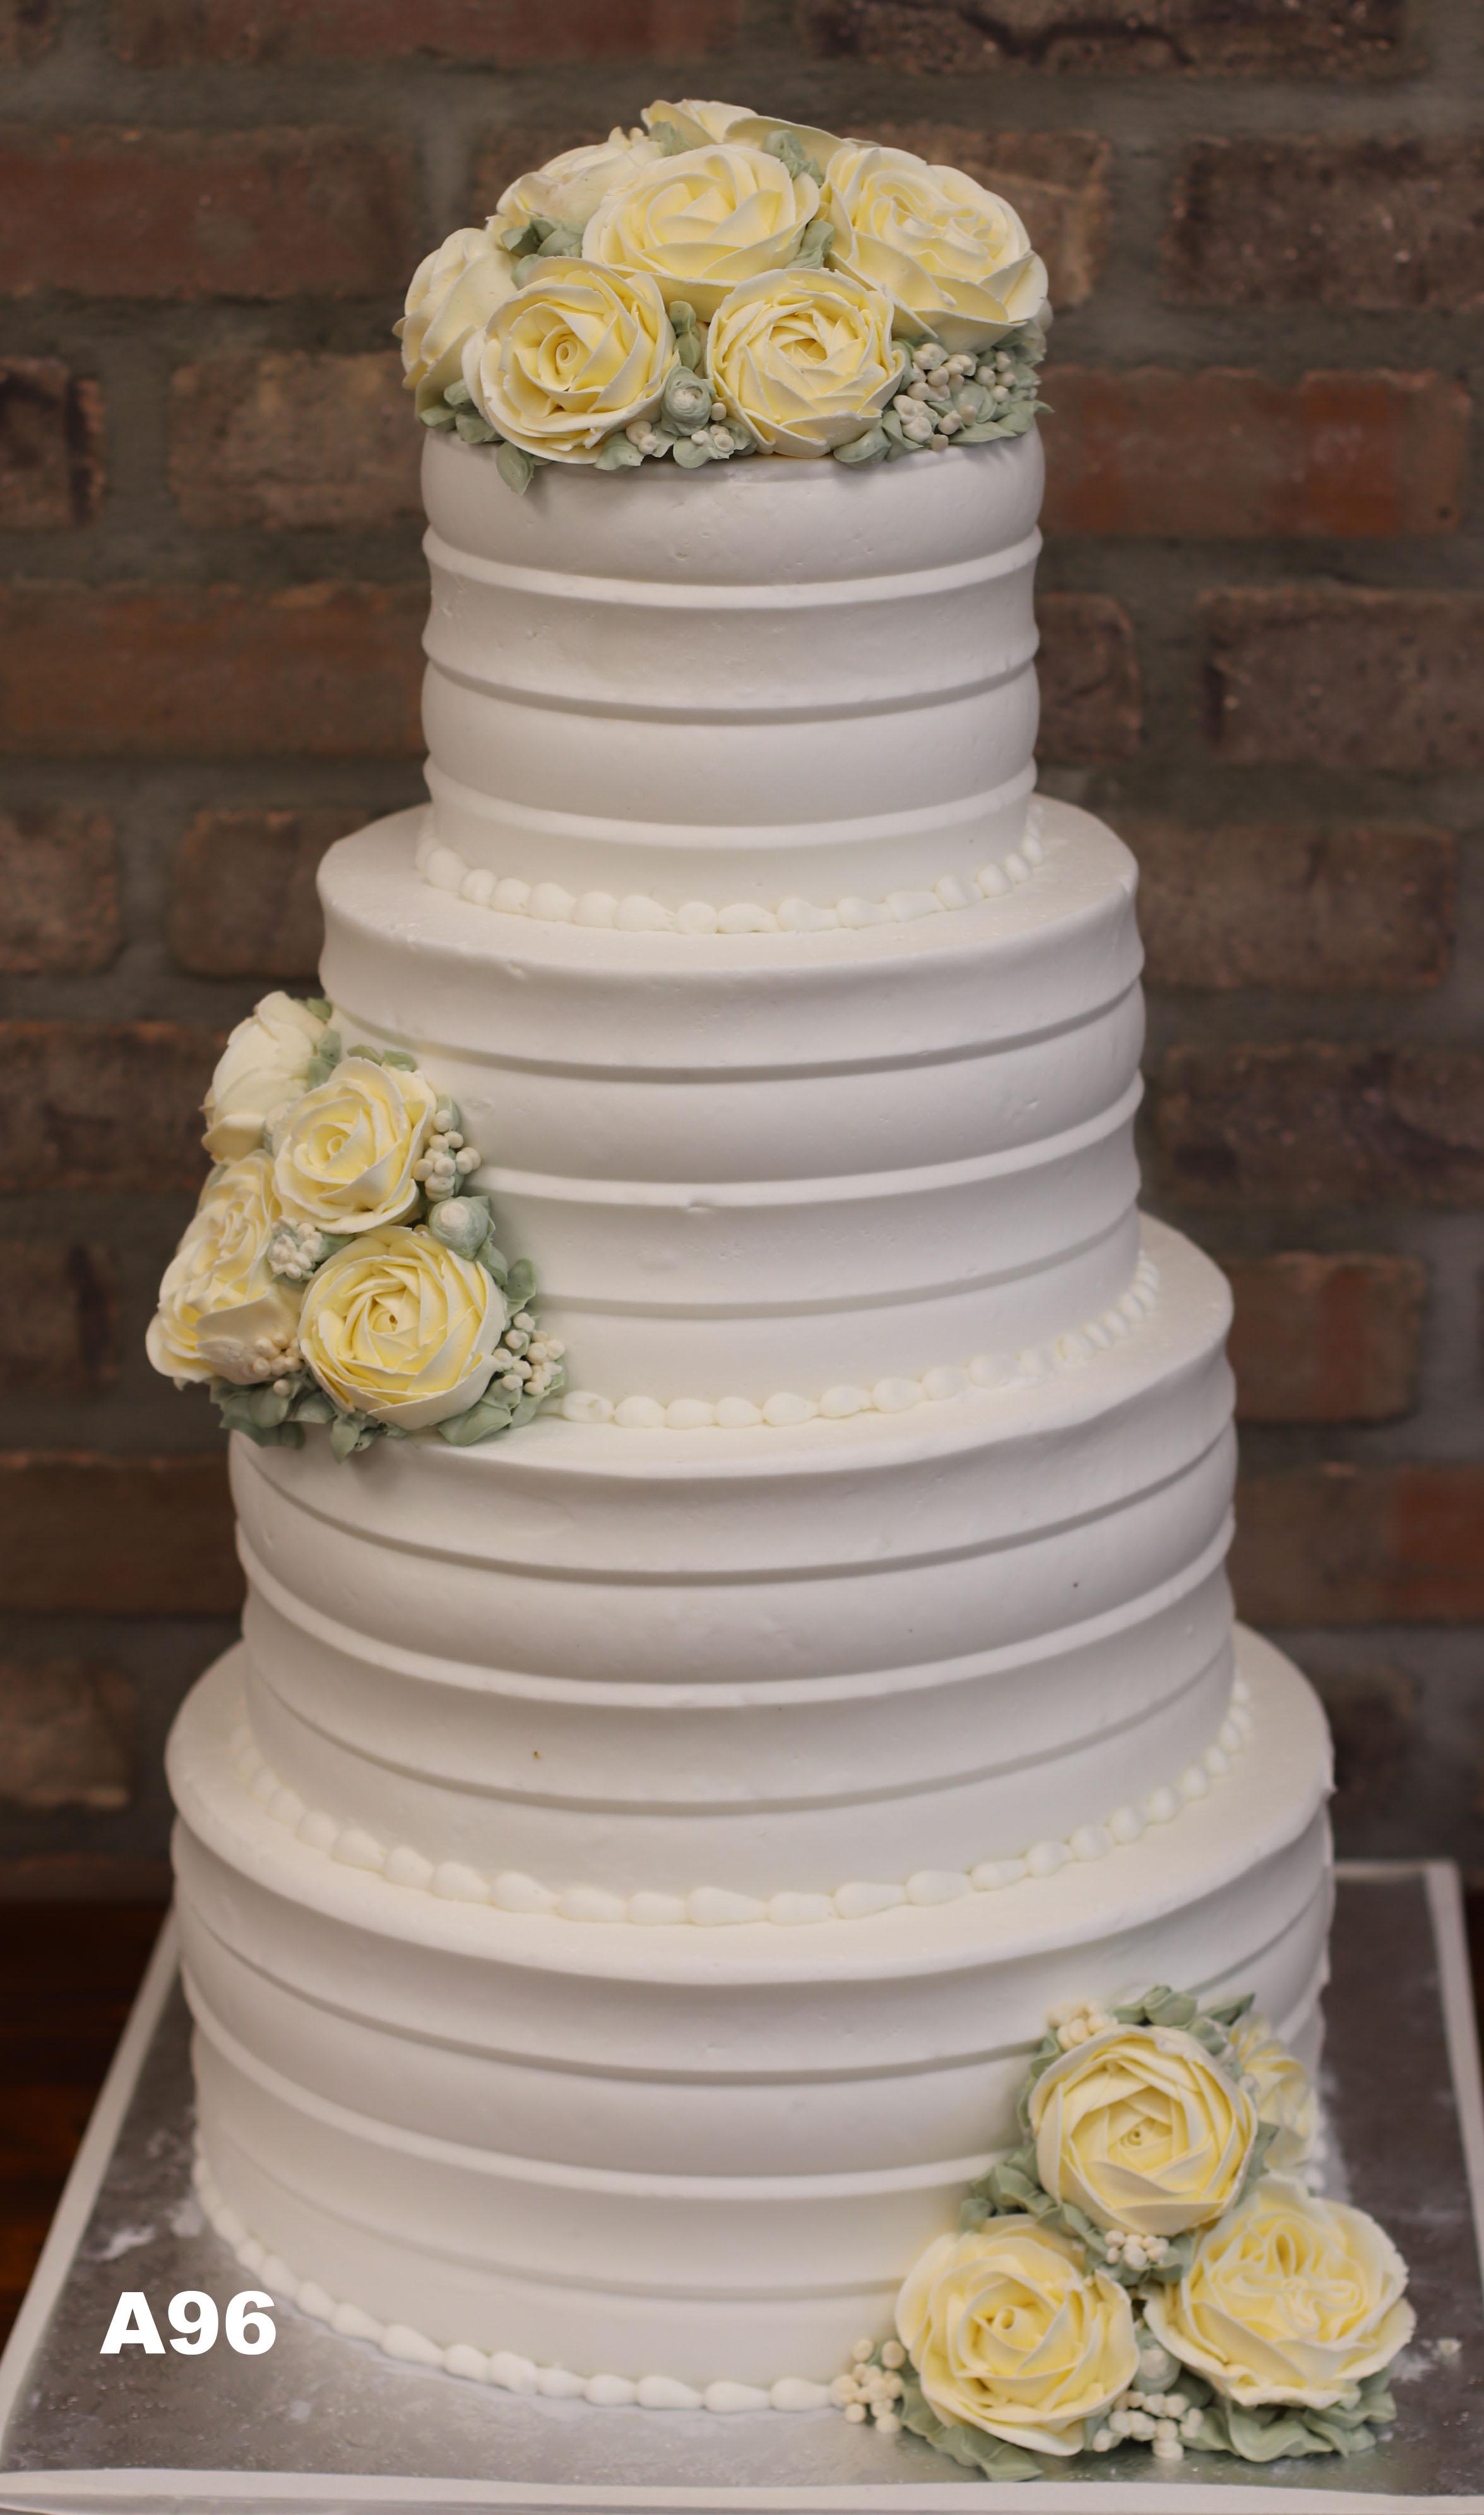 A96  Yellow Rose White Buttercream Cake